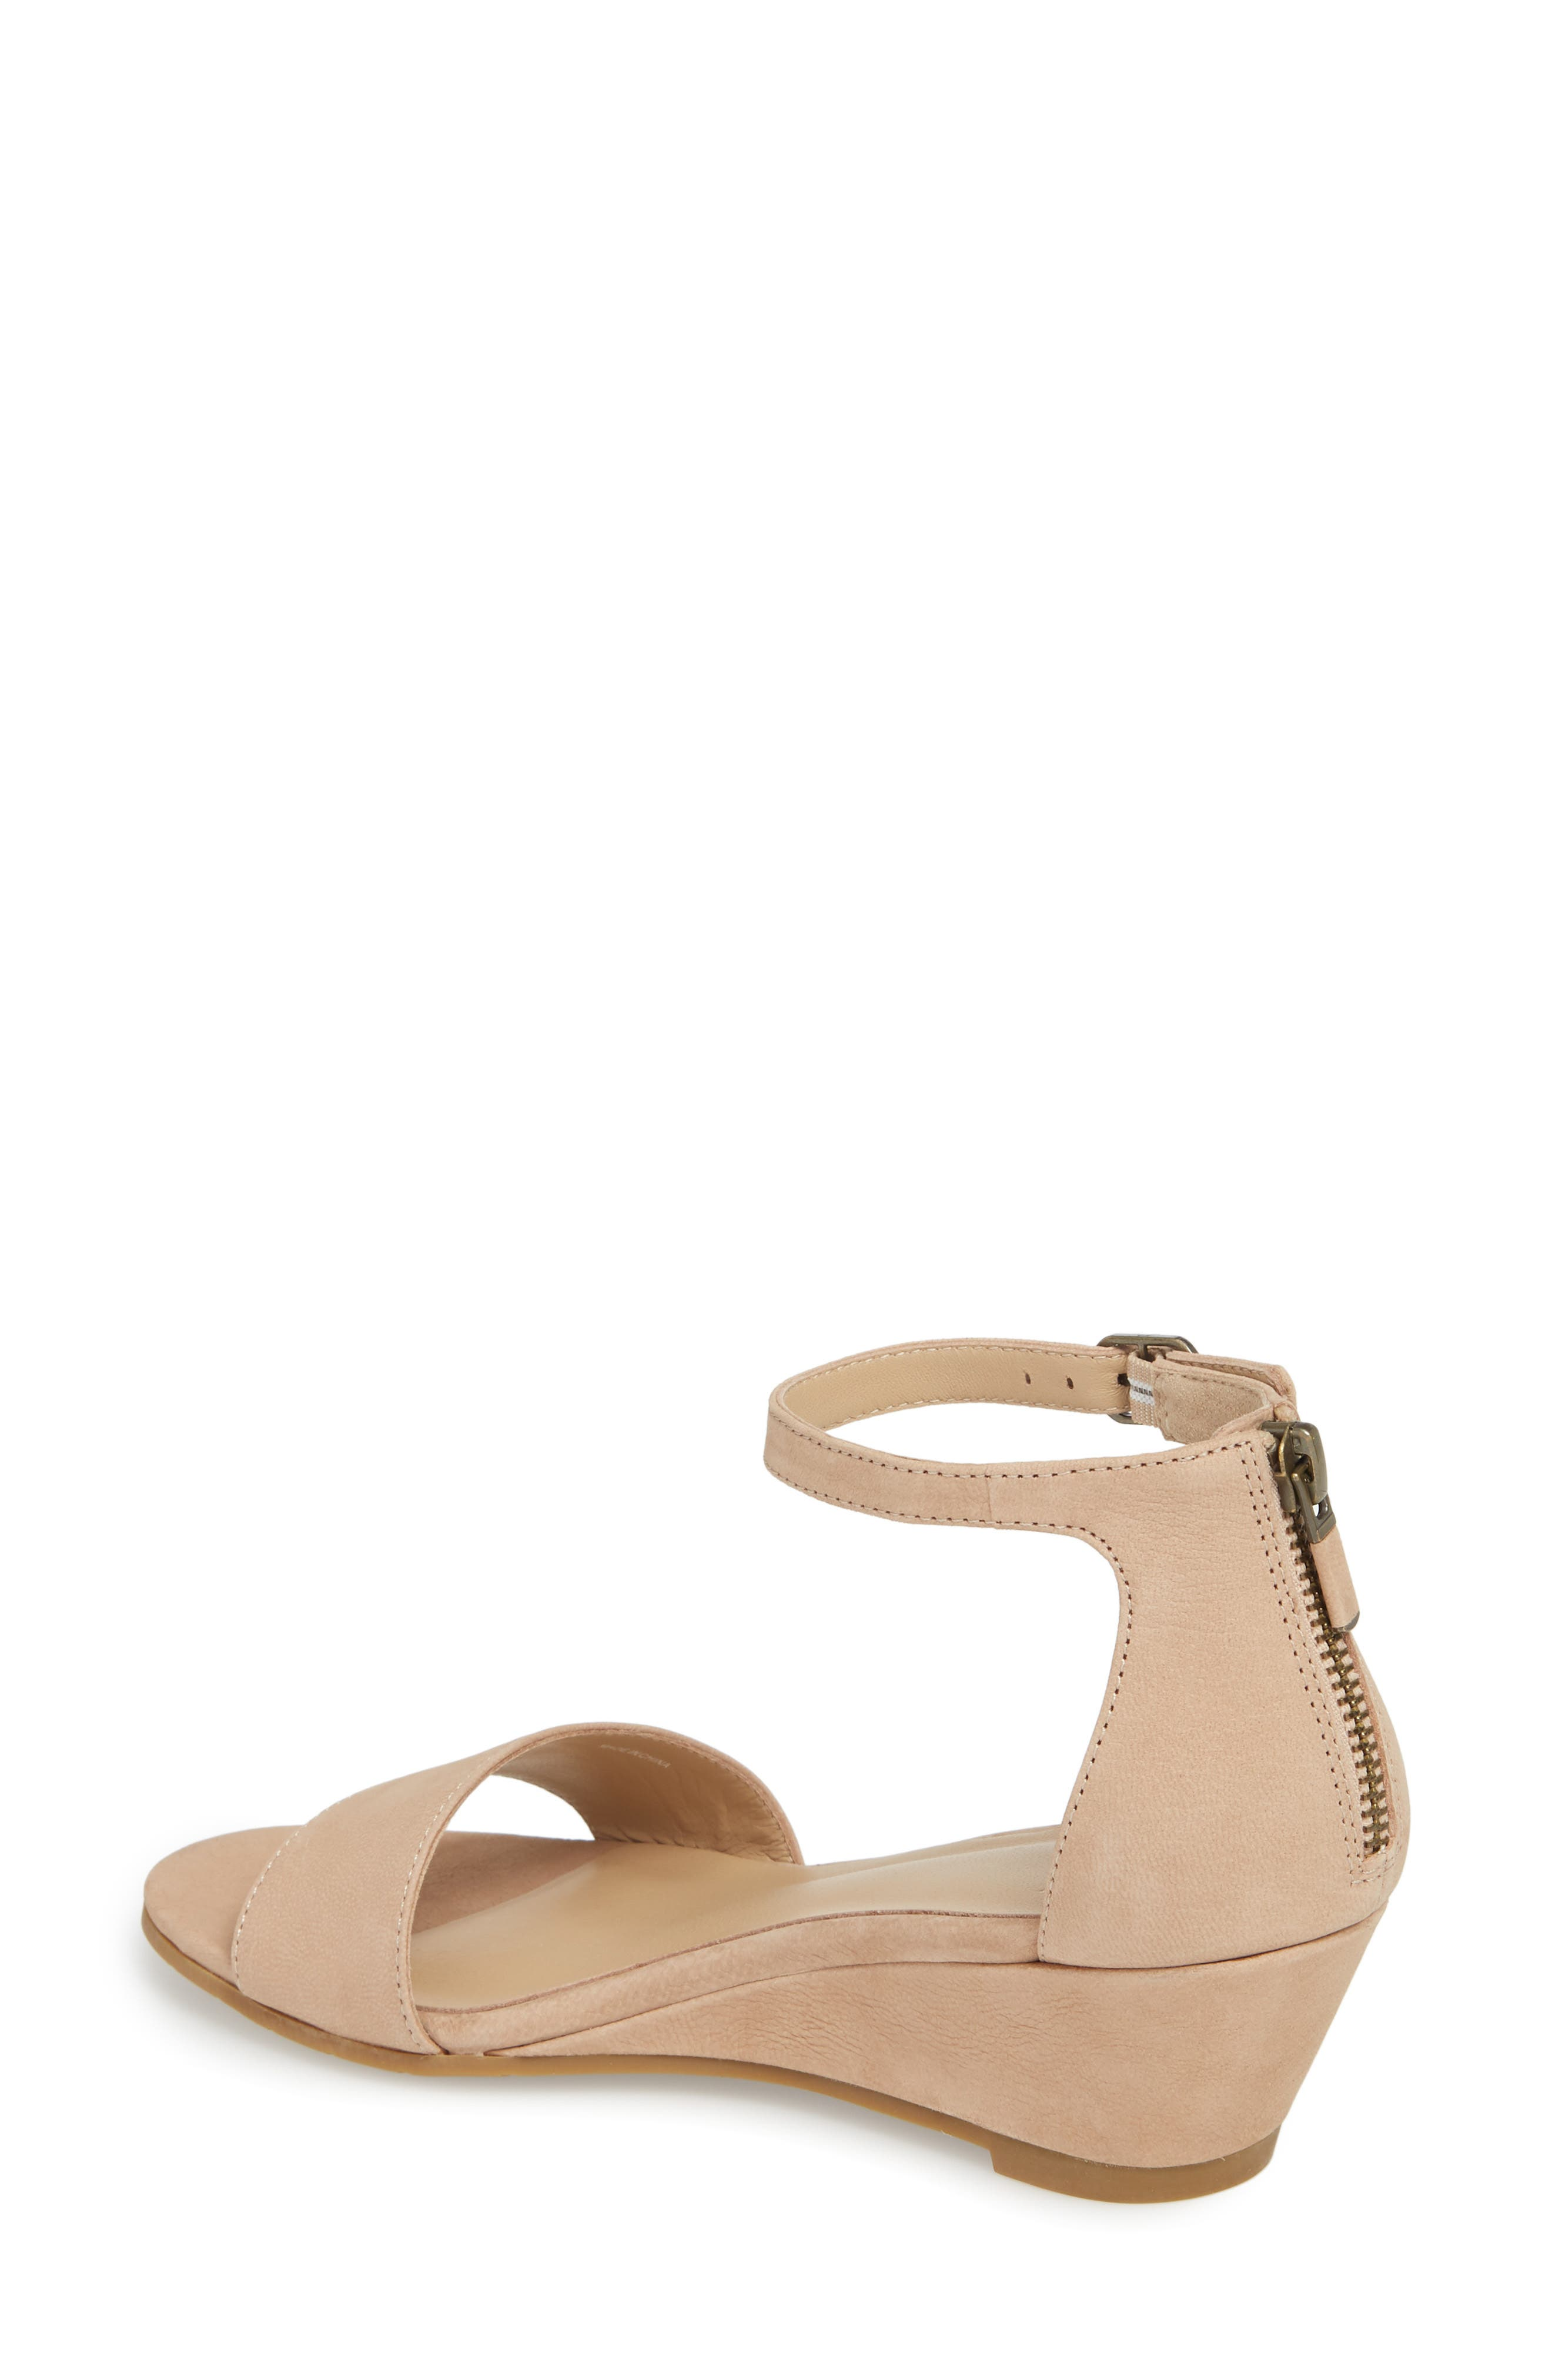 Mara Ankle Strap Wedge Sandal,                             Alternate thumbnail 7, color,